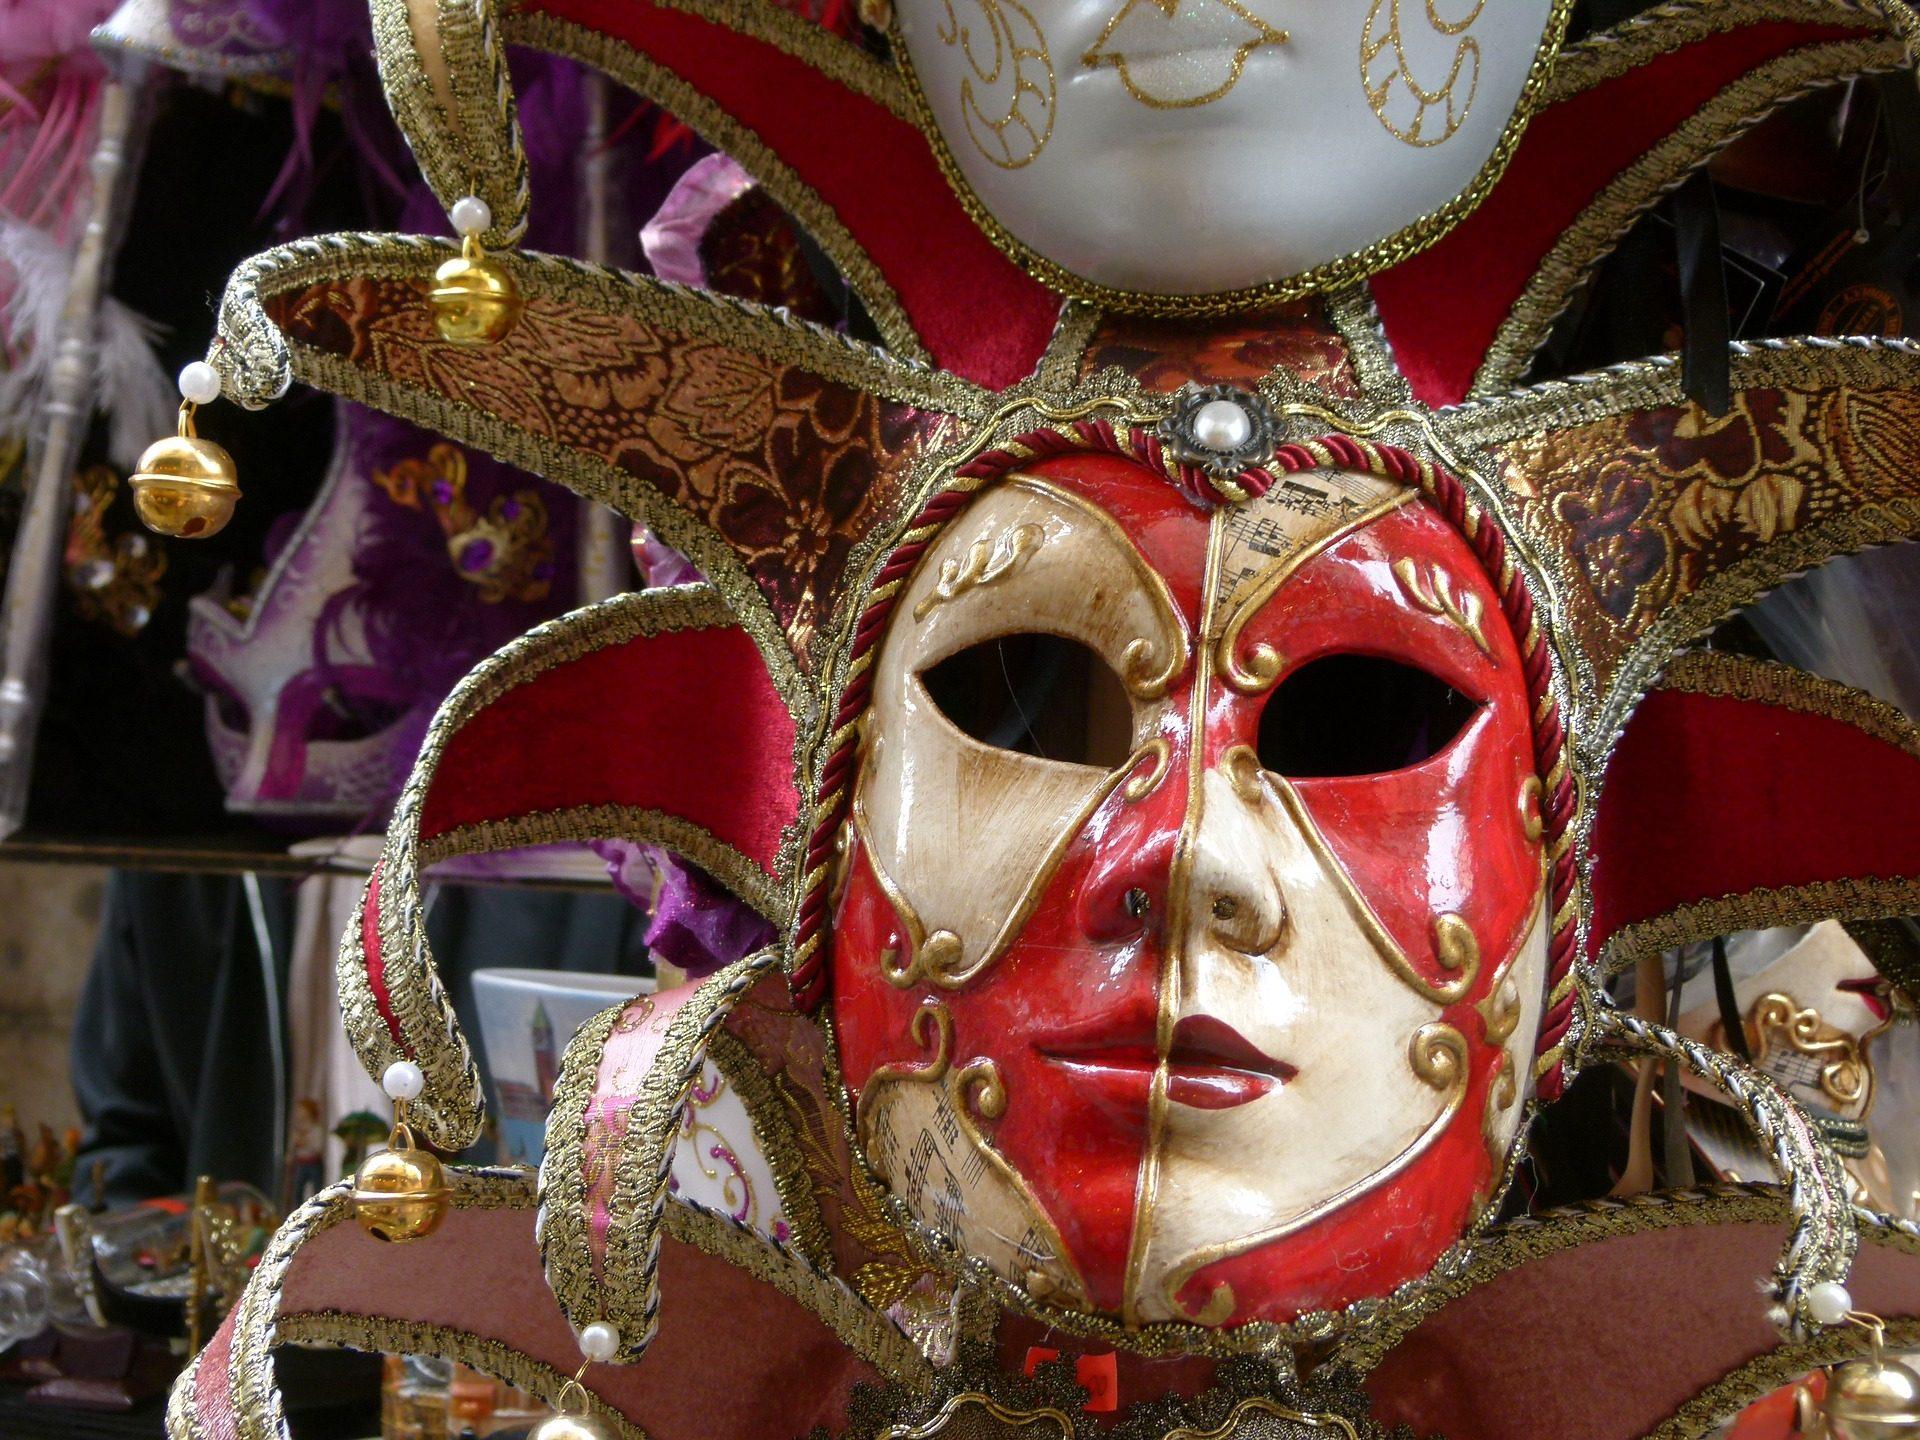 Maske, Kostüm, Karneval, Ornamente, Venedig - Wallpaper HD - Prof.-falken.com